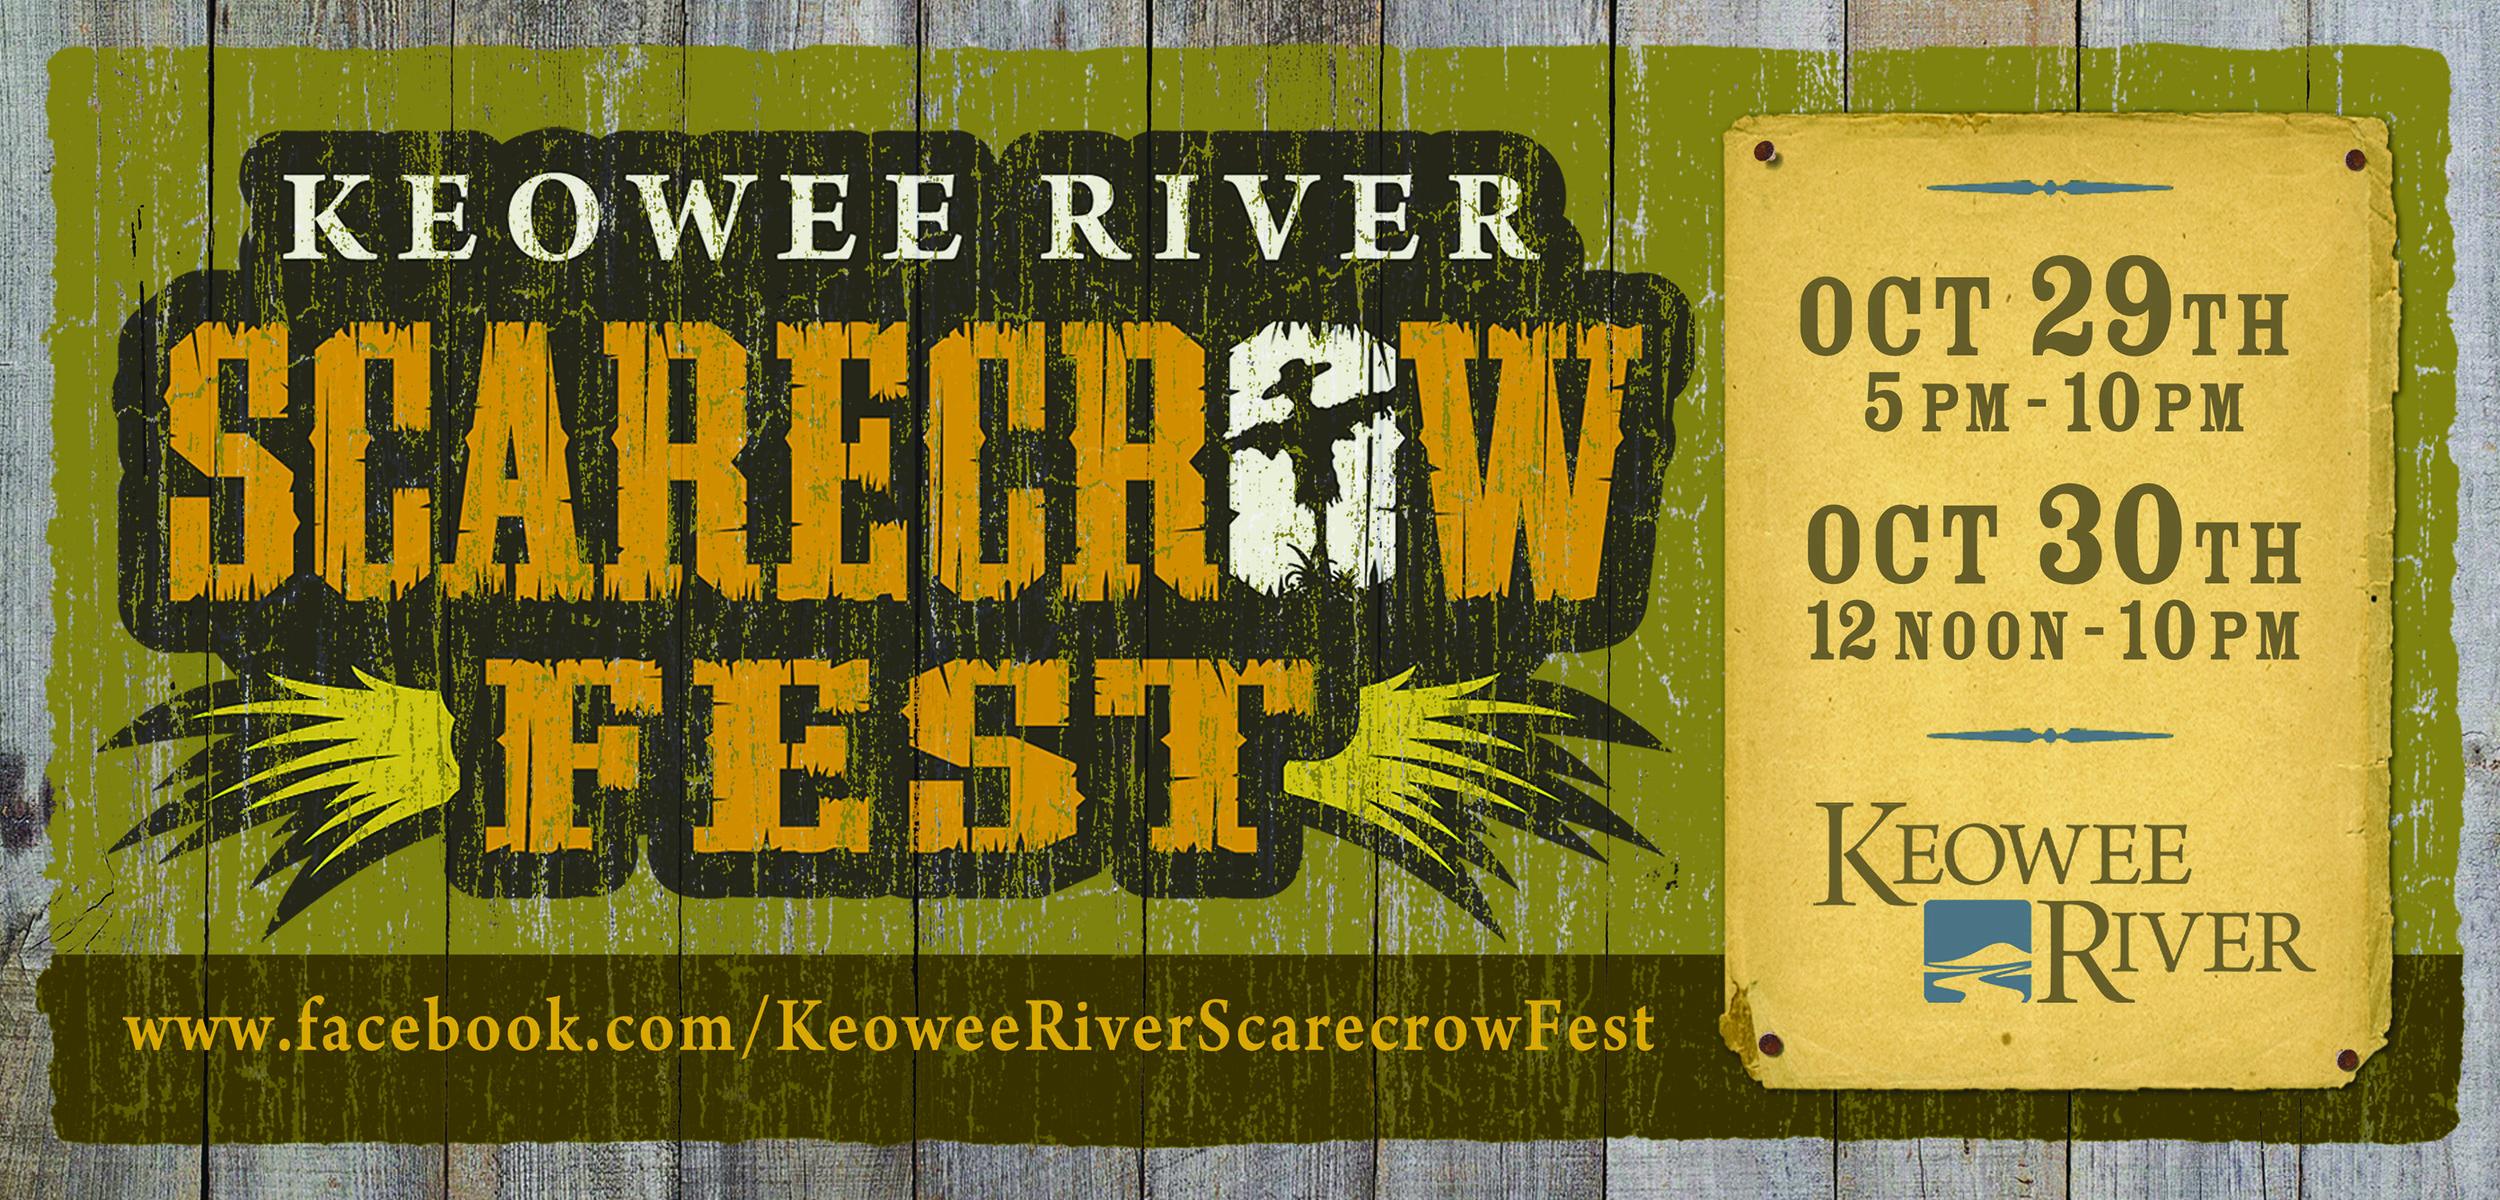 Keowee River Scarecrow Fest Outdoor Board